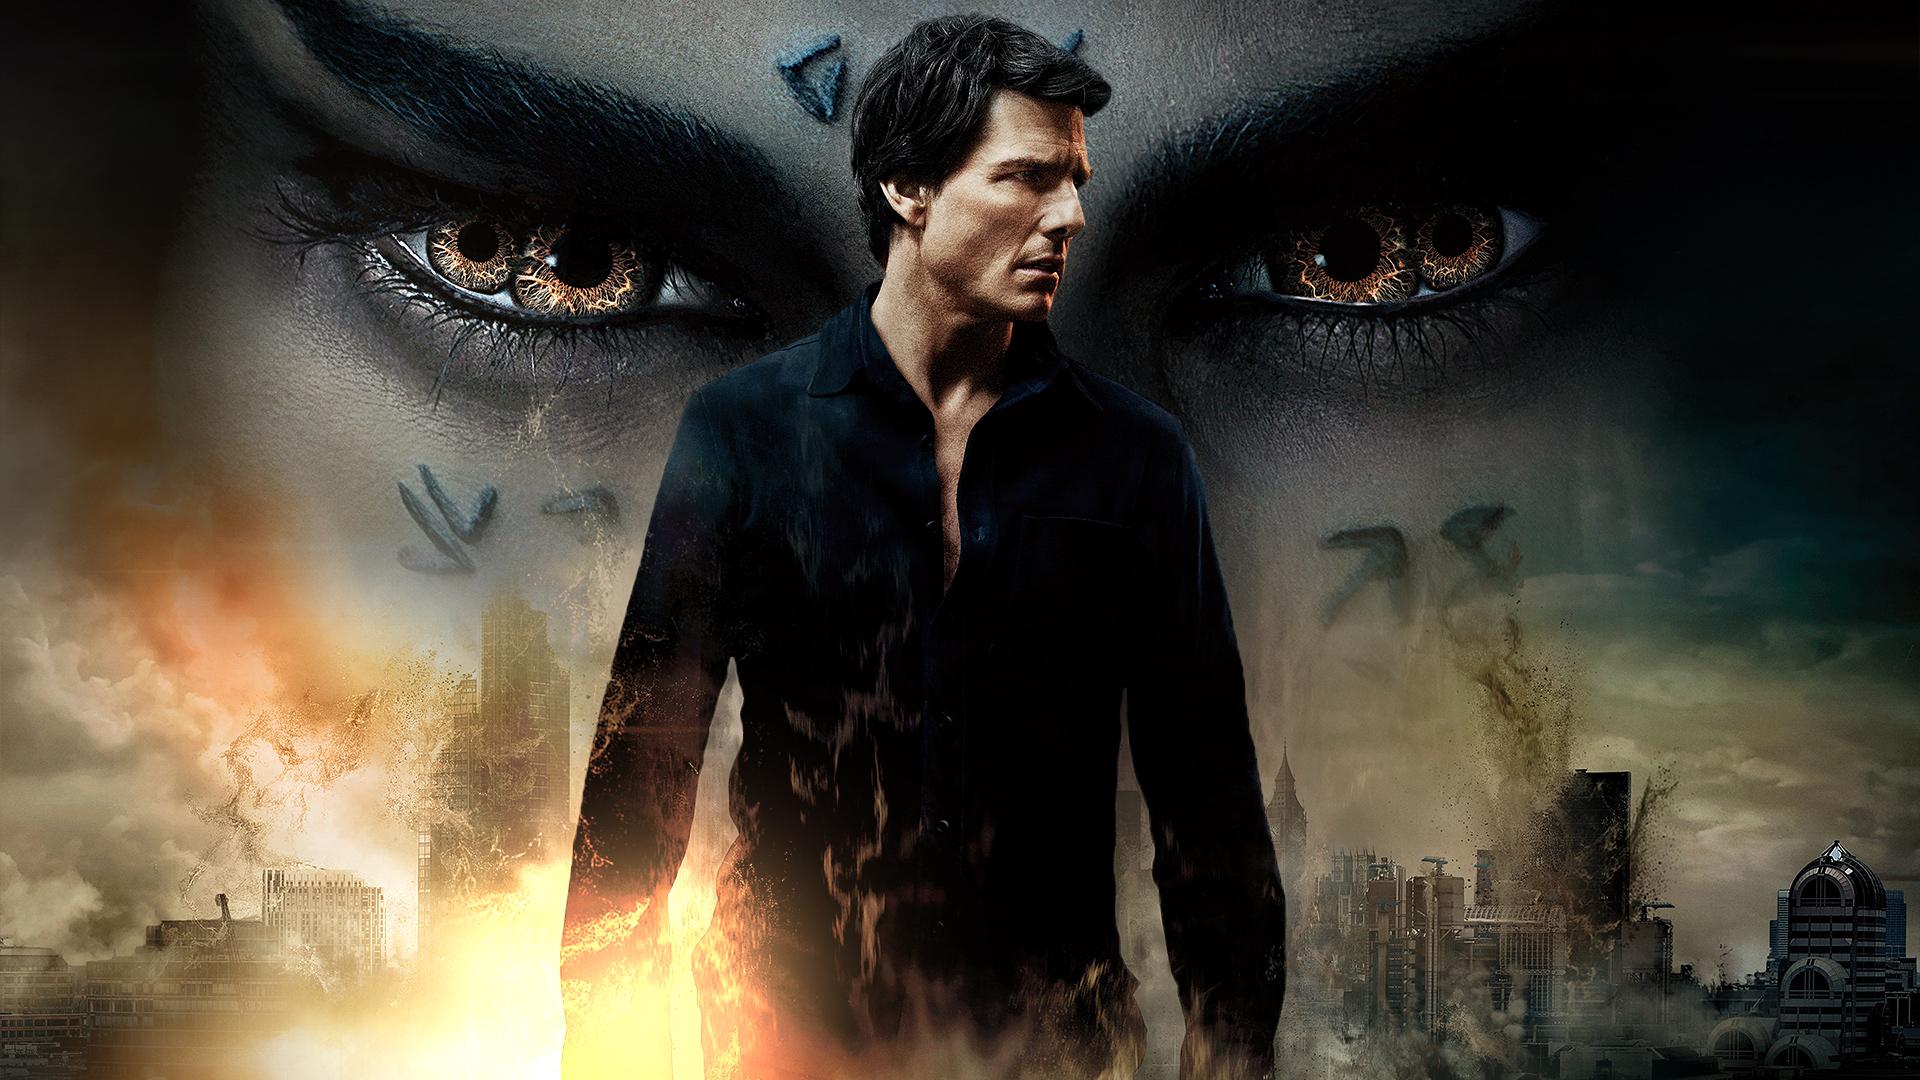 Wallpaper The Mummy 2017 Movies Hd Movies 4142: Movie Fanart